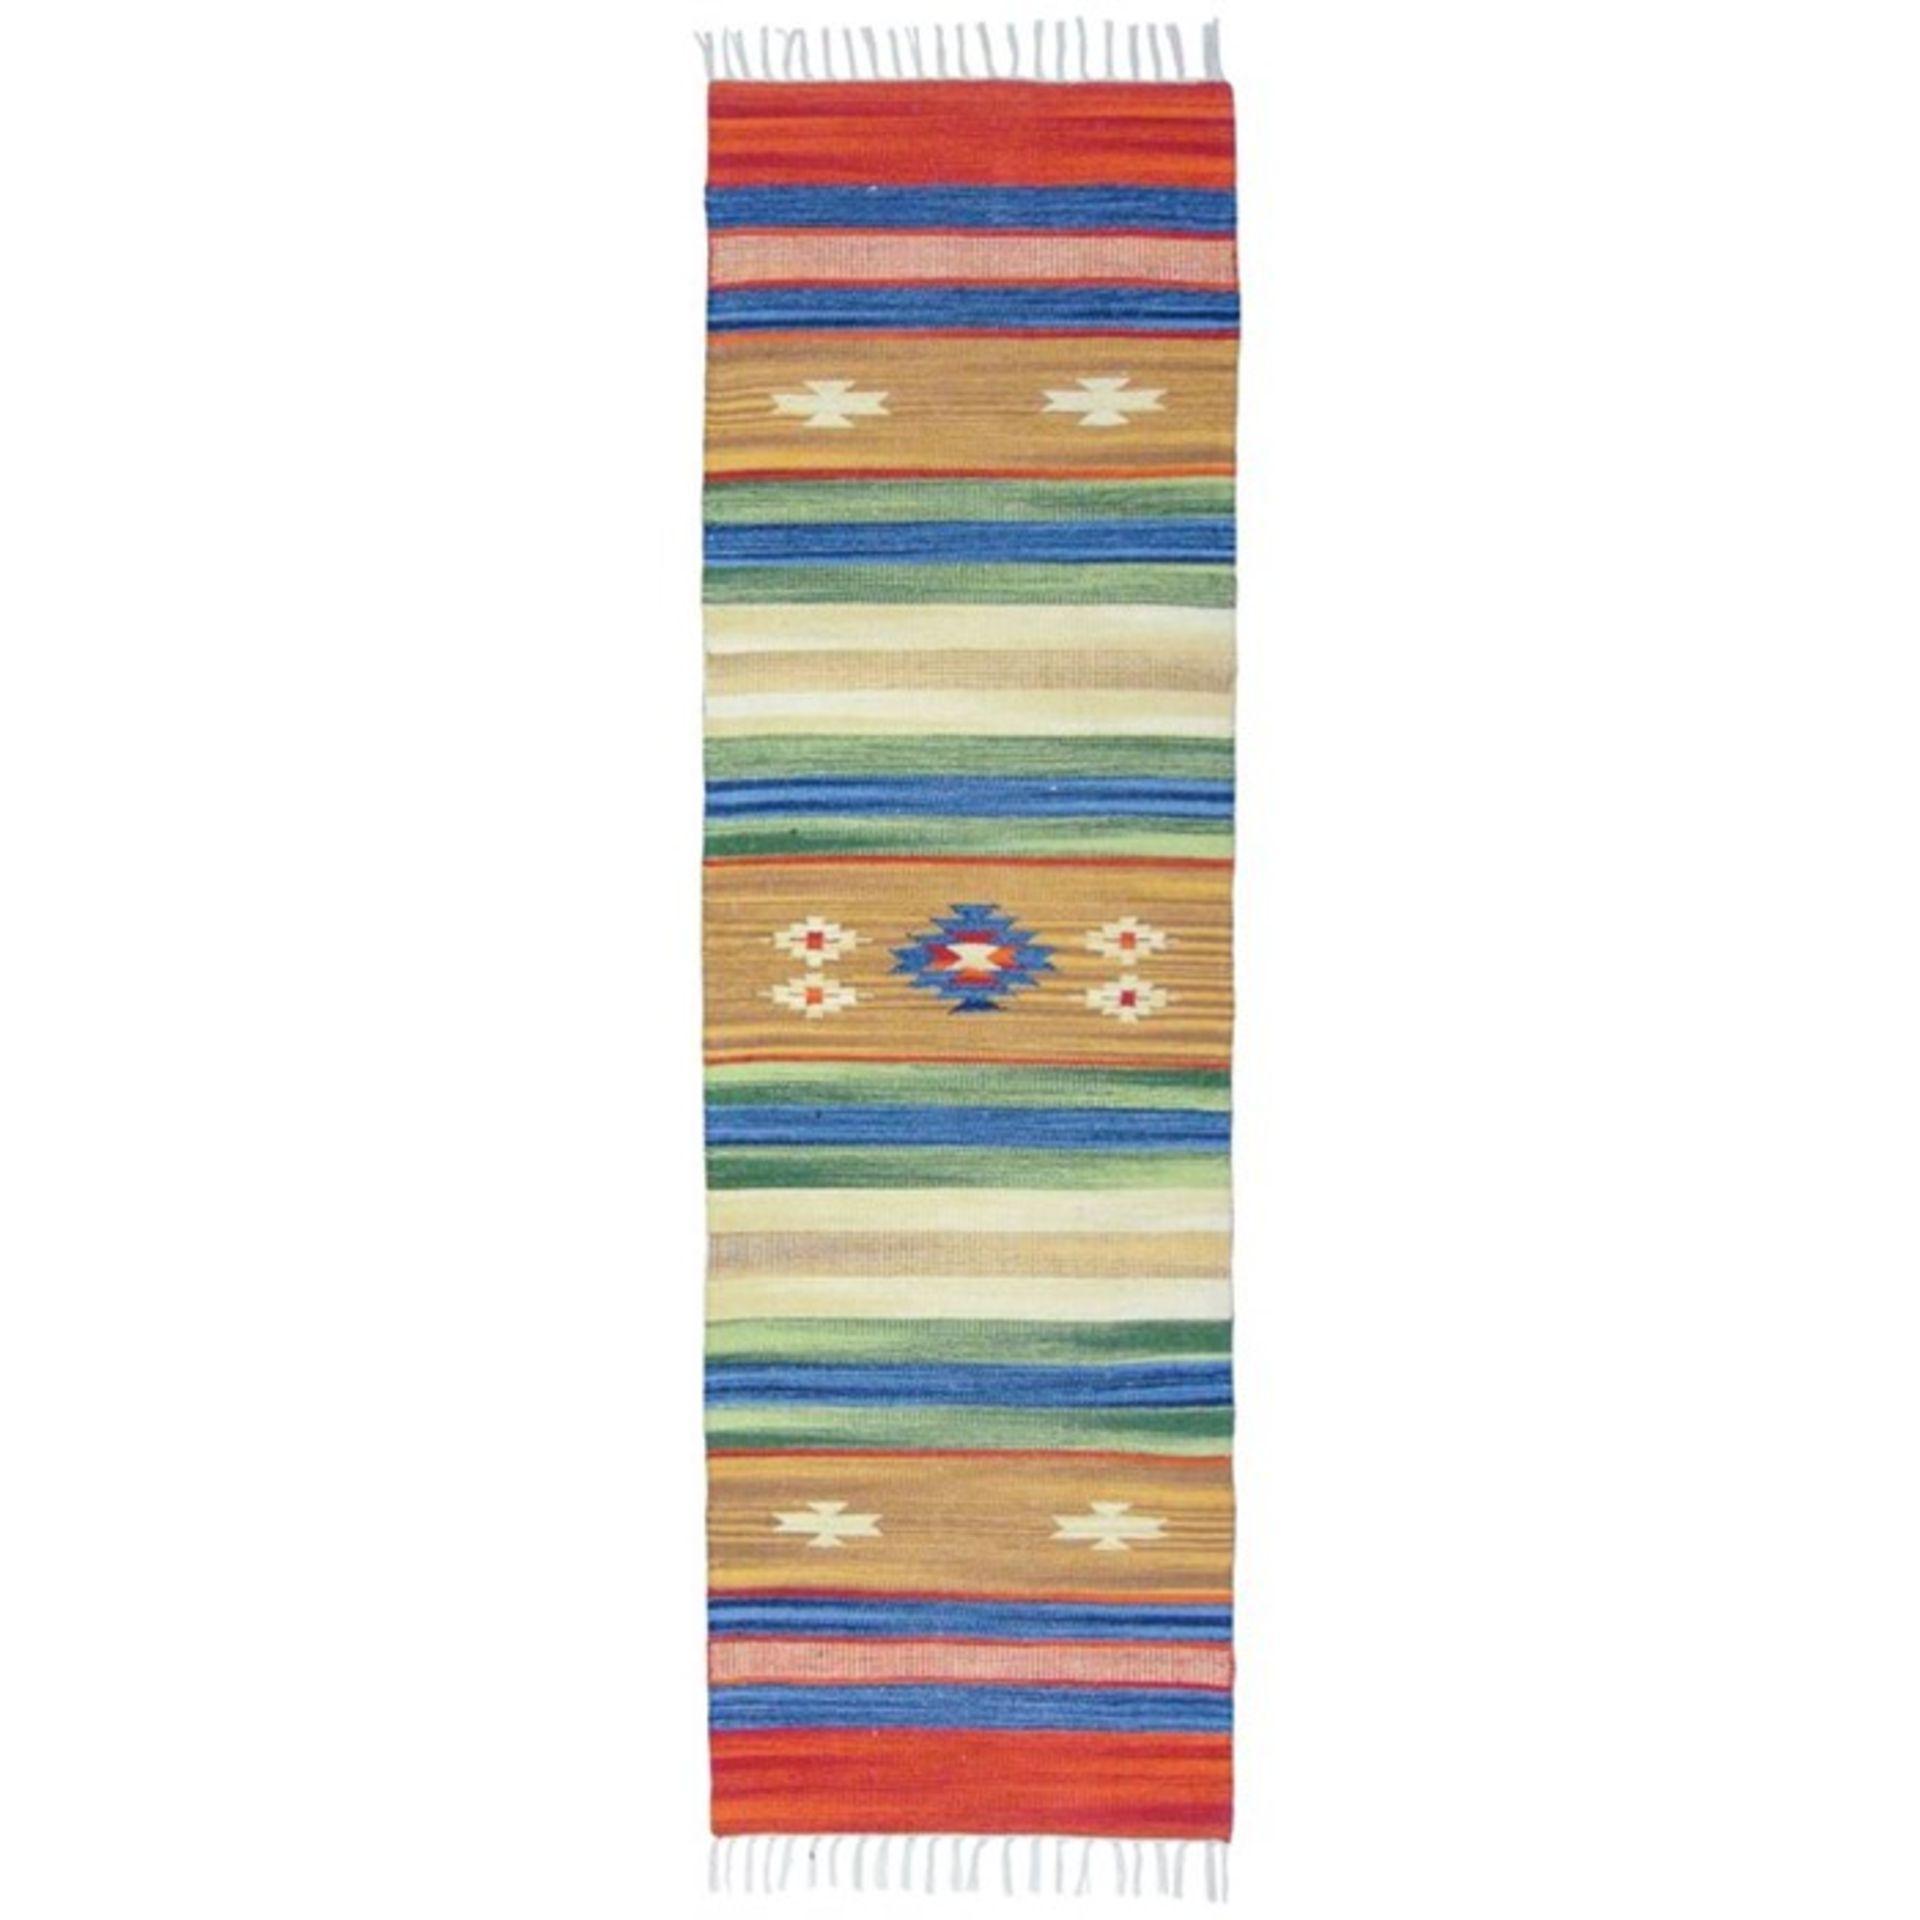 Bakero,Country Handwoven Cotton Brown Rug - RRP £25.99 (BAKR3762 -17633/19)